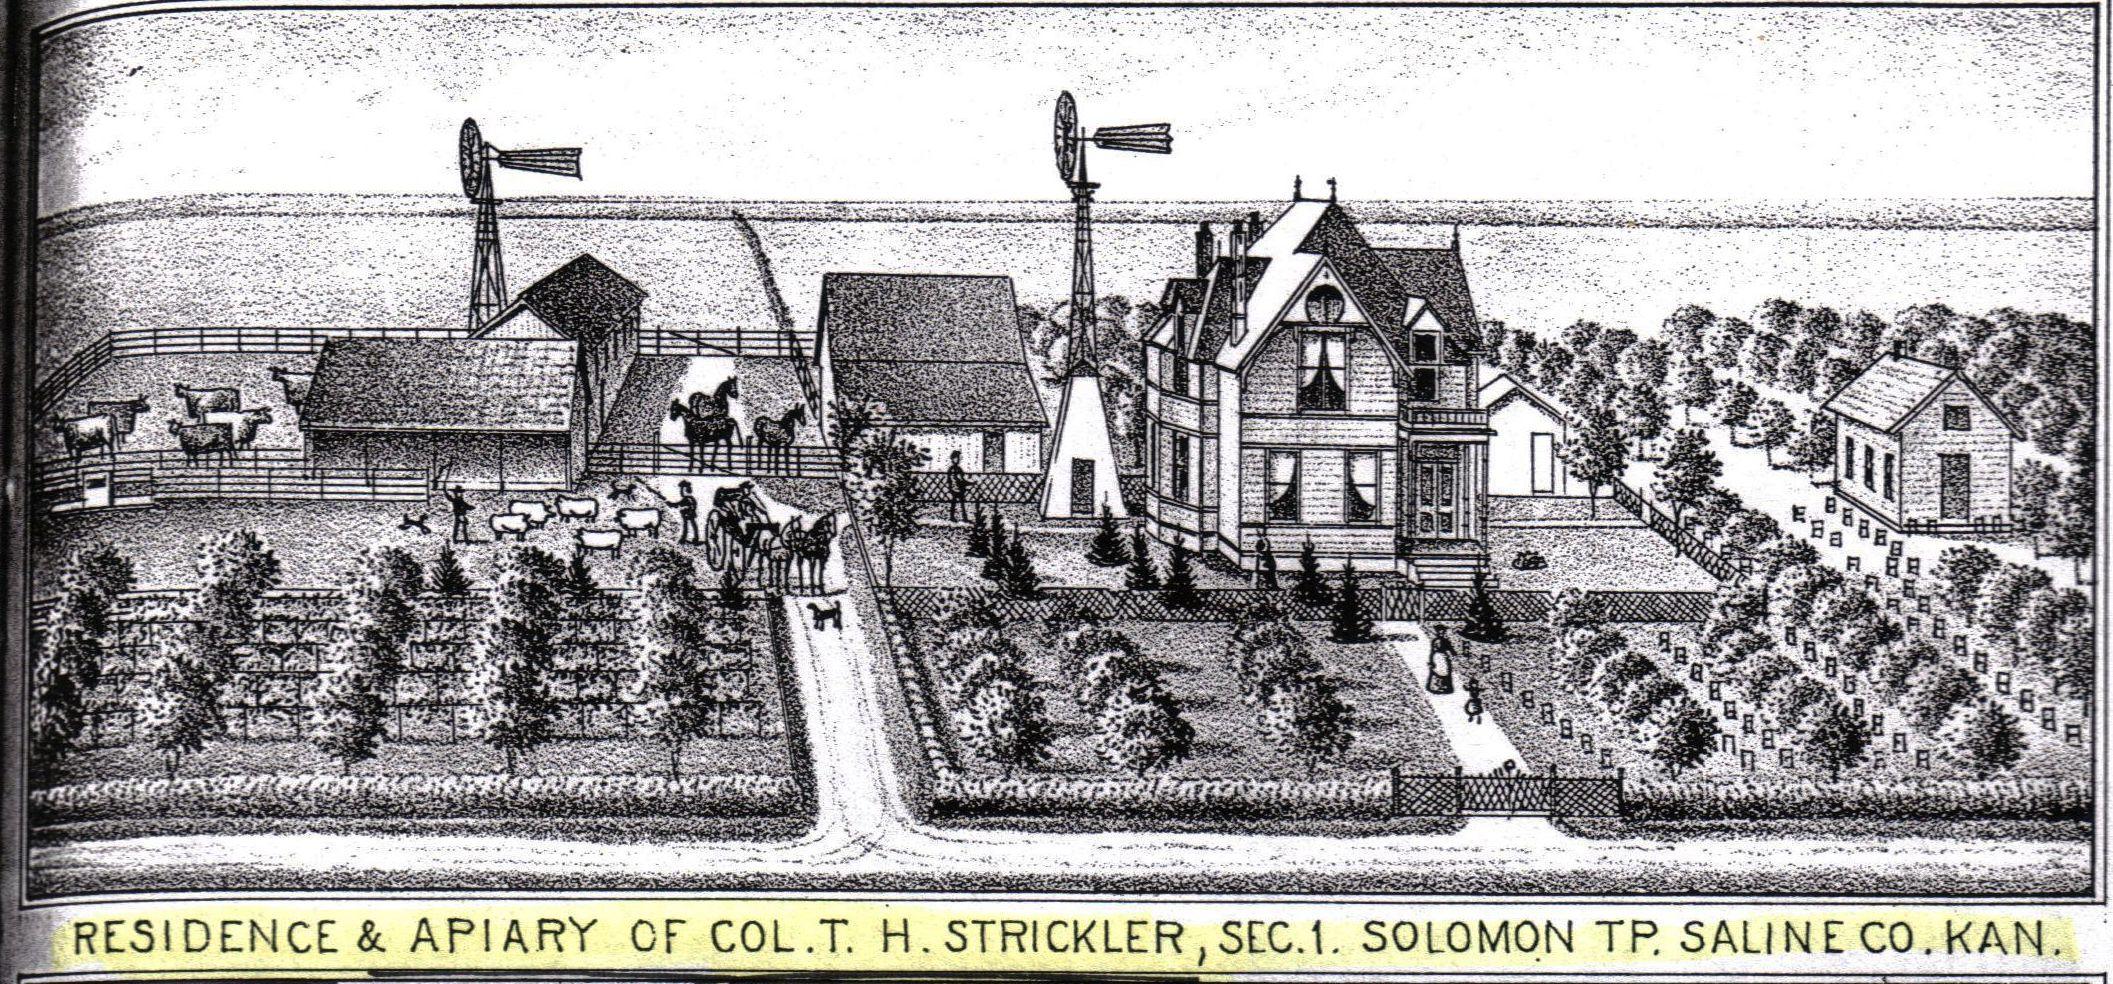 Kansas dickinson county solomon - Strickler Farm Solomon Ks